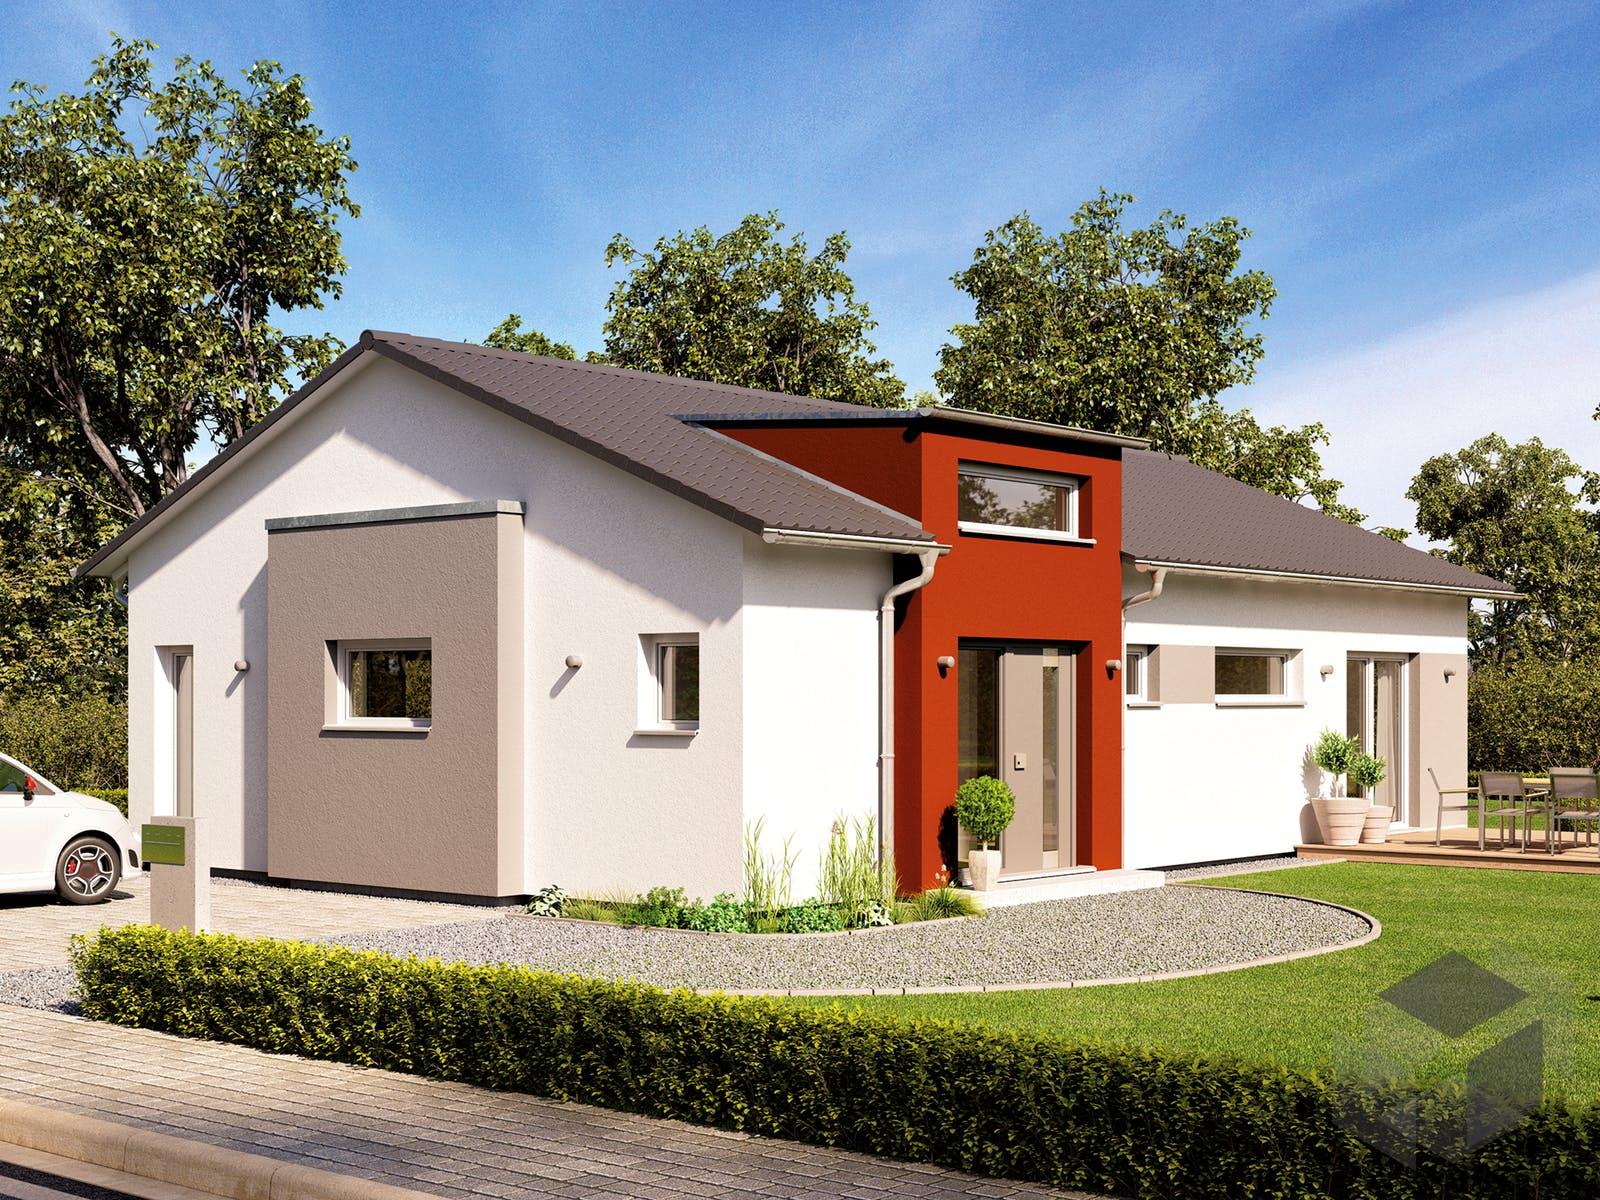 solution 100 v4 von living haus komplette daten bersicht. Black Bedroom Furniture Sets. Home Design Ideas